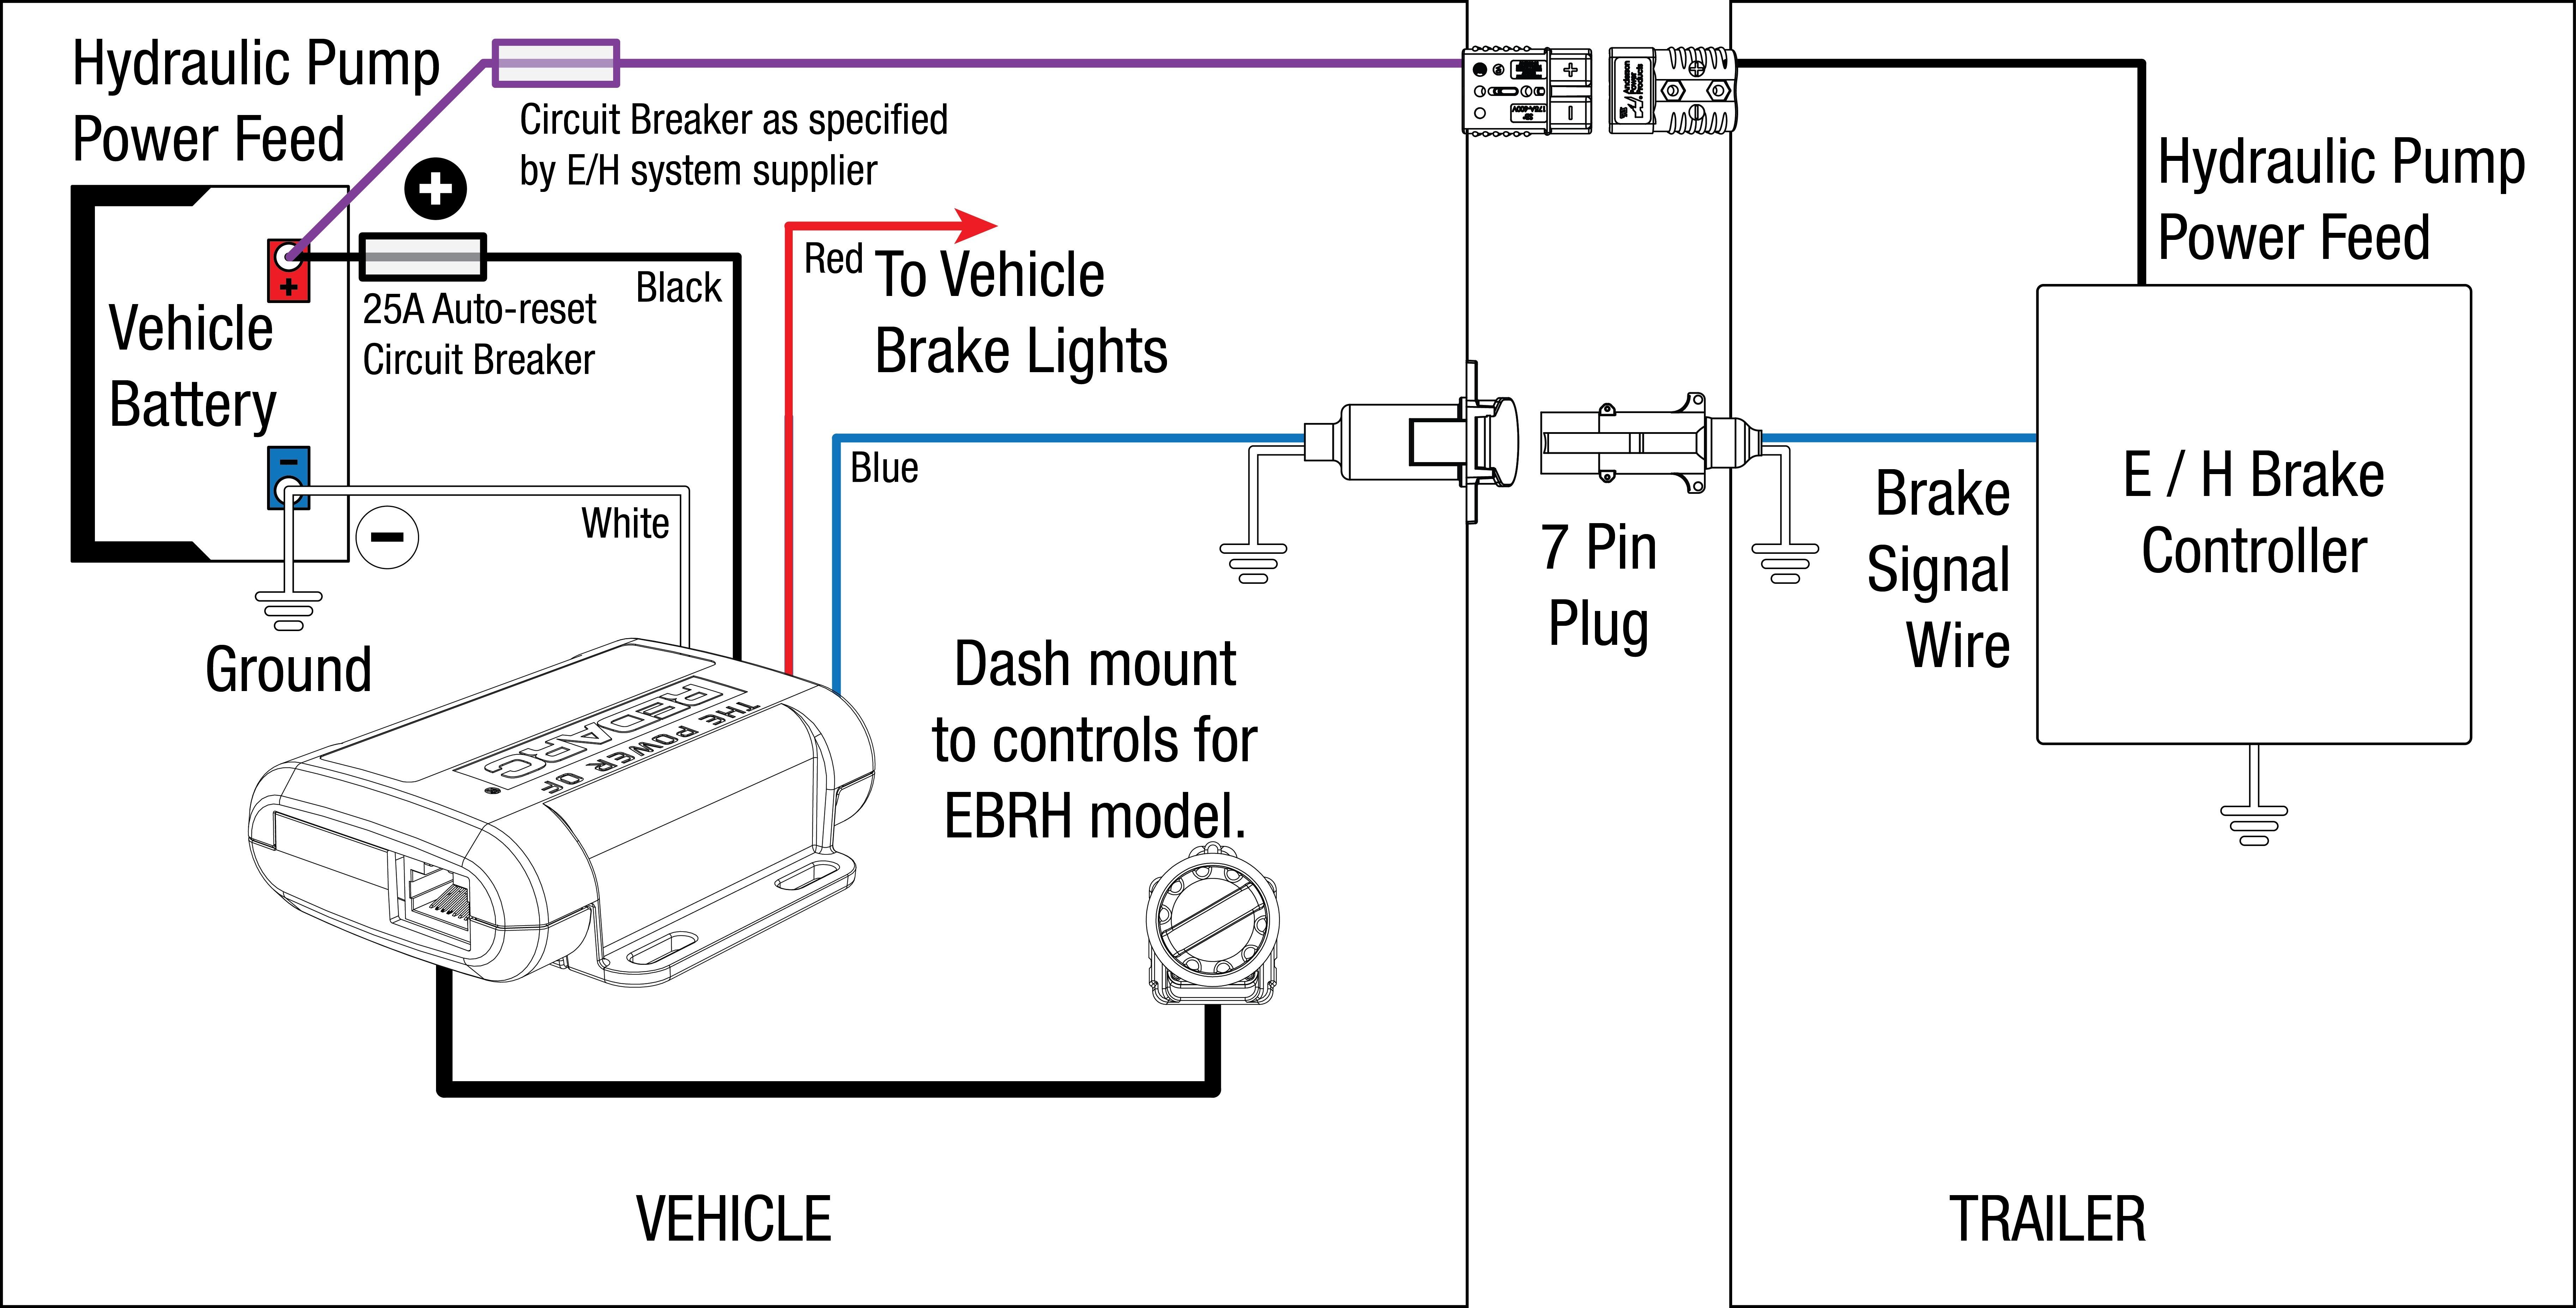 brake switch wiring diagram brake light wiring diagram luxury rh detoxicrecenze com Dodge Truck Wiring Diagram Detroit Series 60 ECM Wiring Diagram